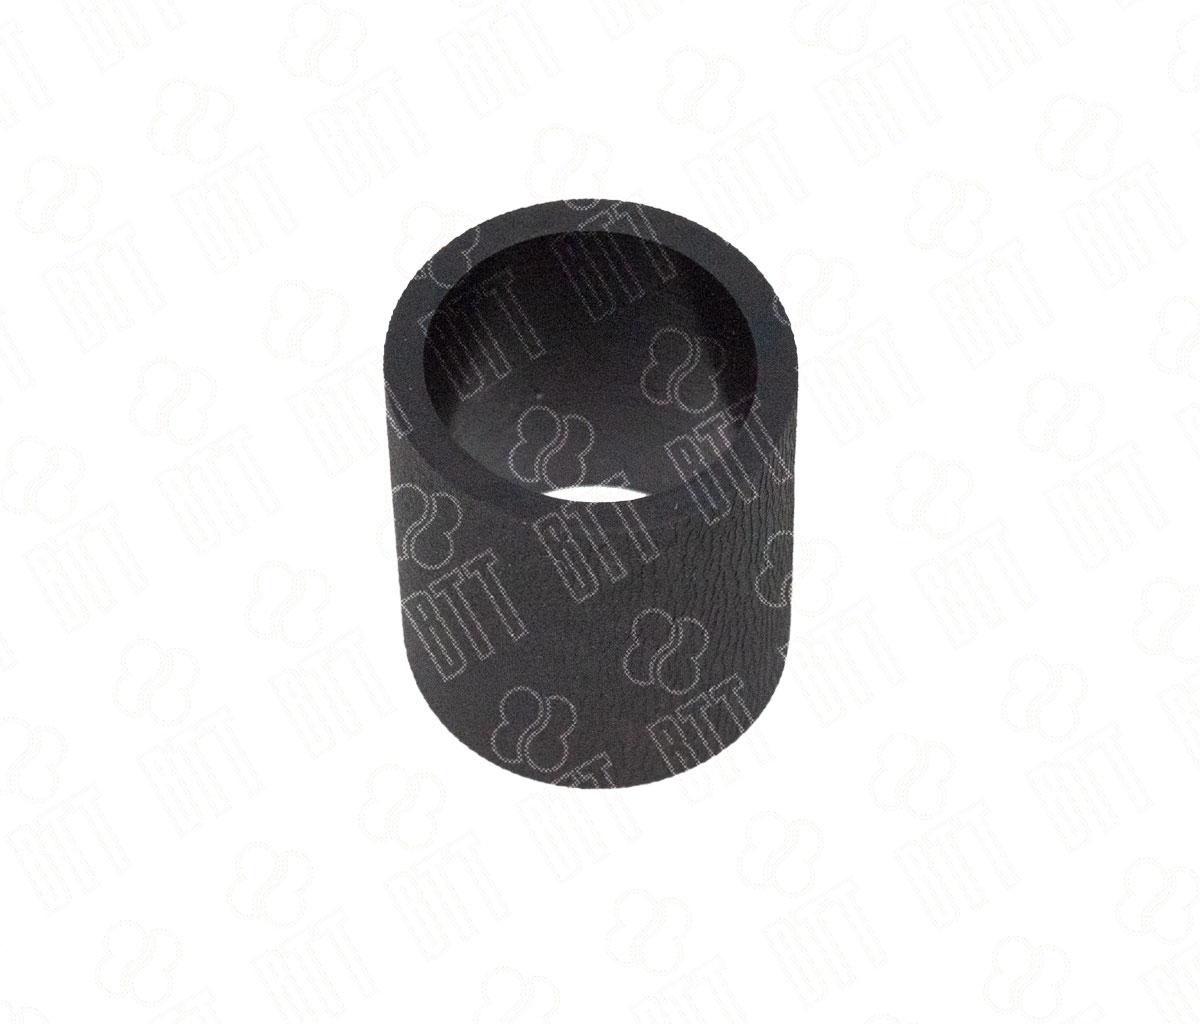 Насадка (резинка) на ролик захвата для SamsungML-2850/2815/SCX-4824/Ph3250 (совм)